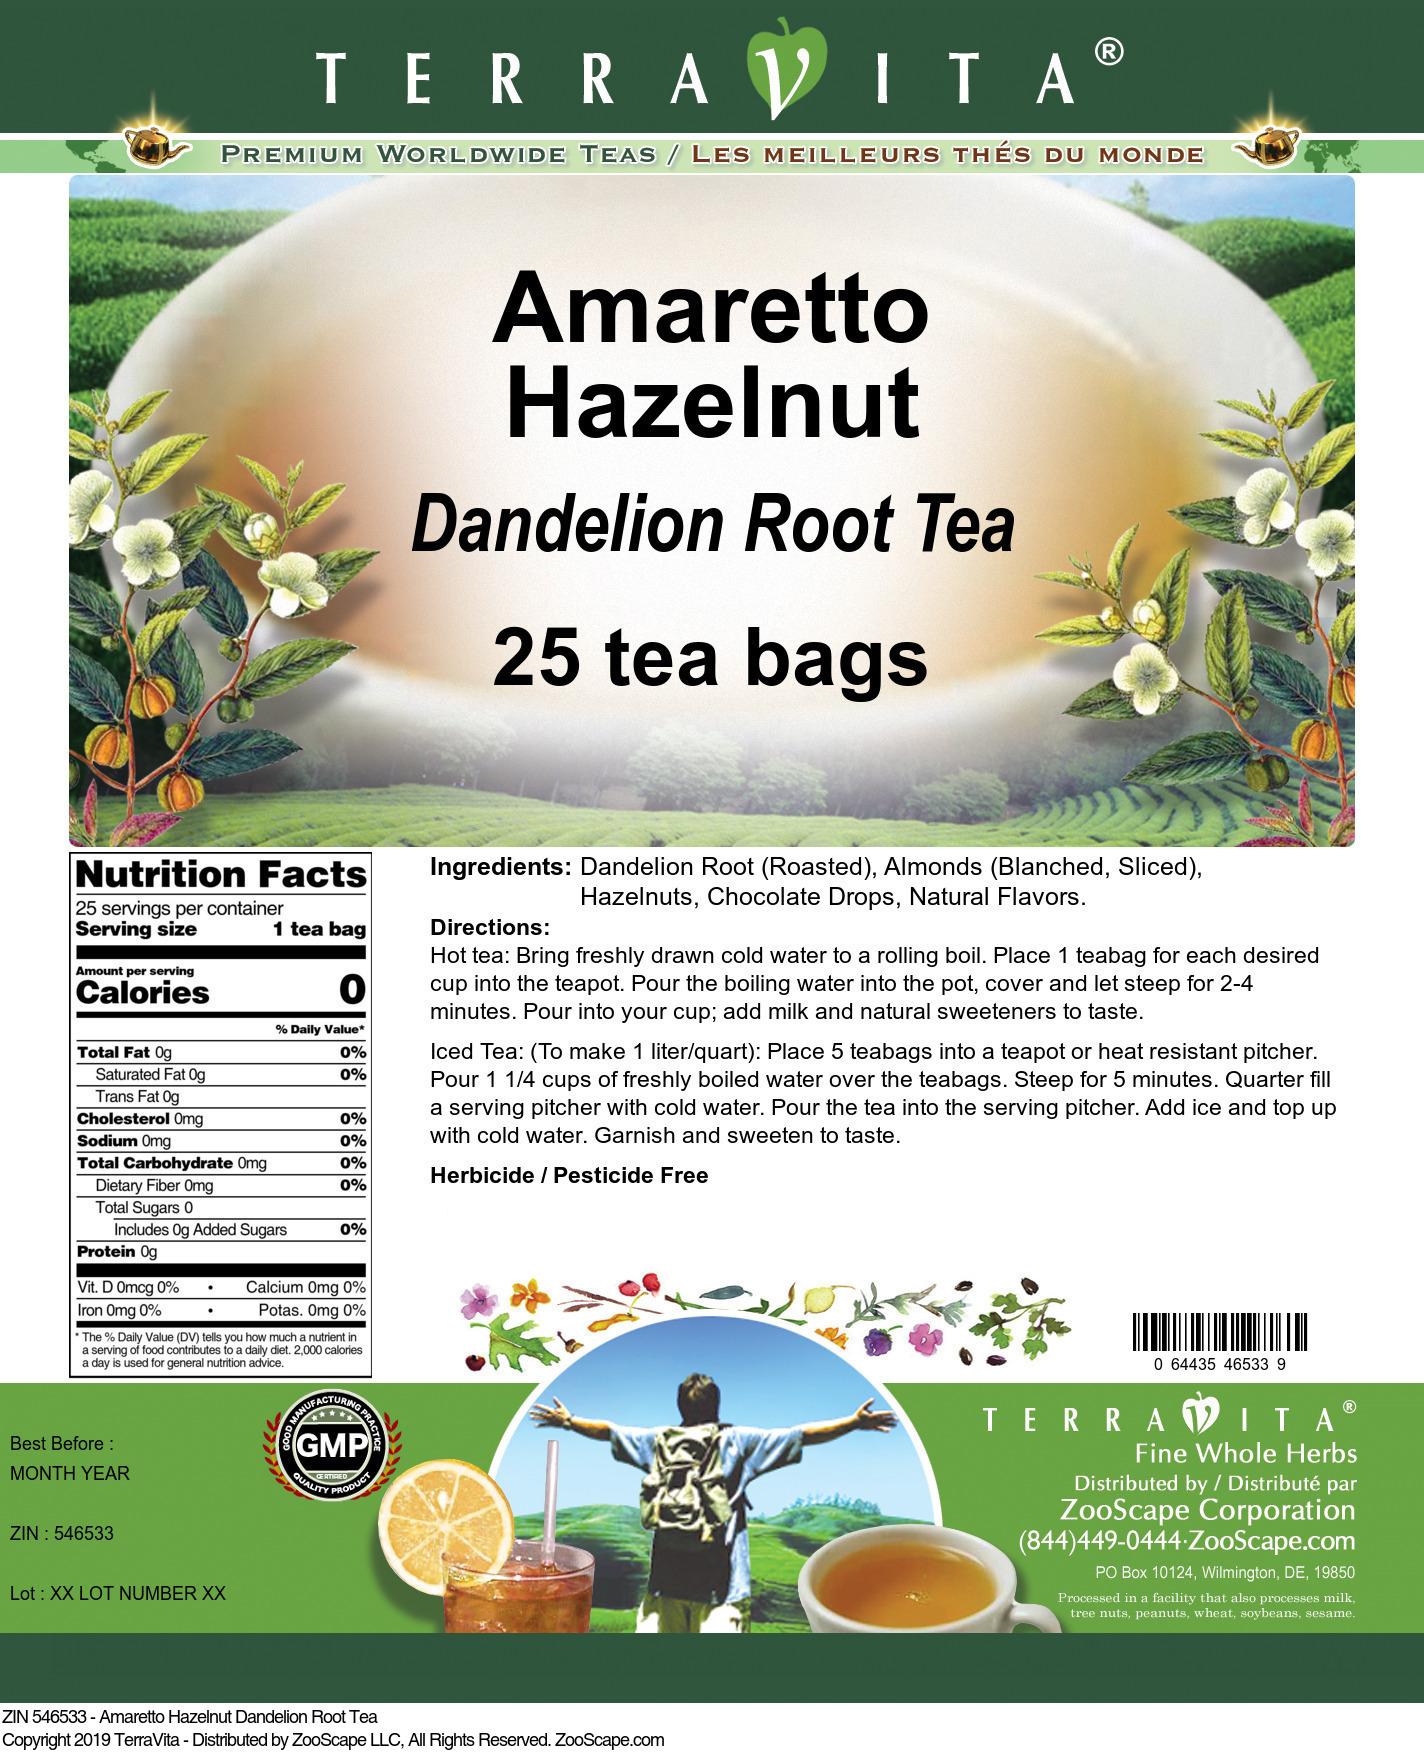 Amaretto Hazelnut Dandelion Root Tea